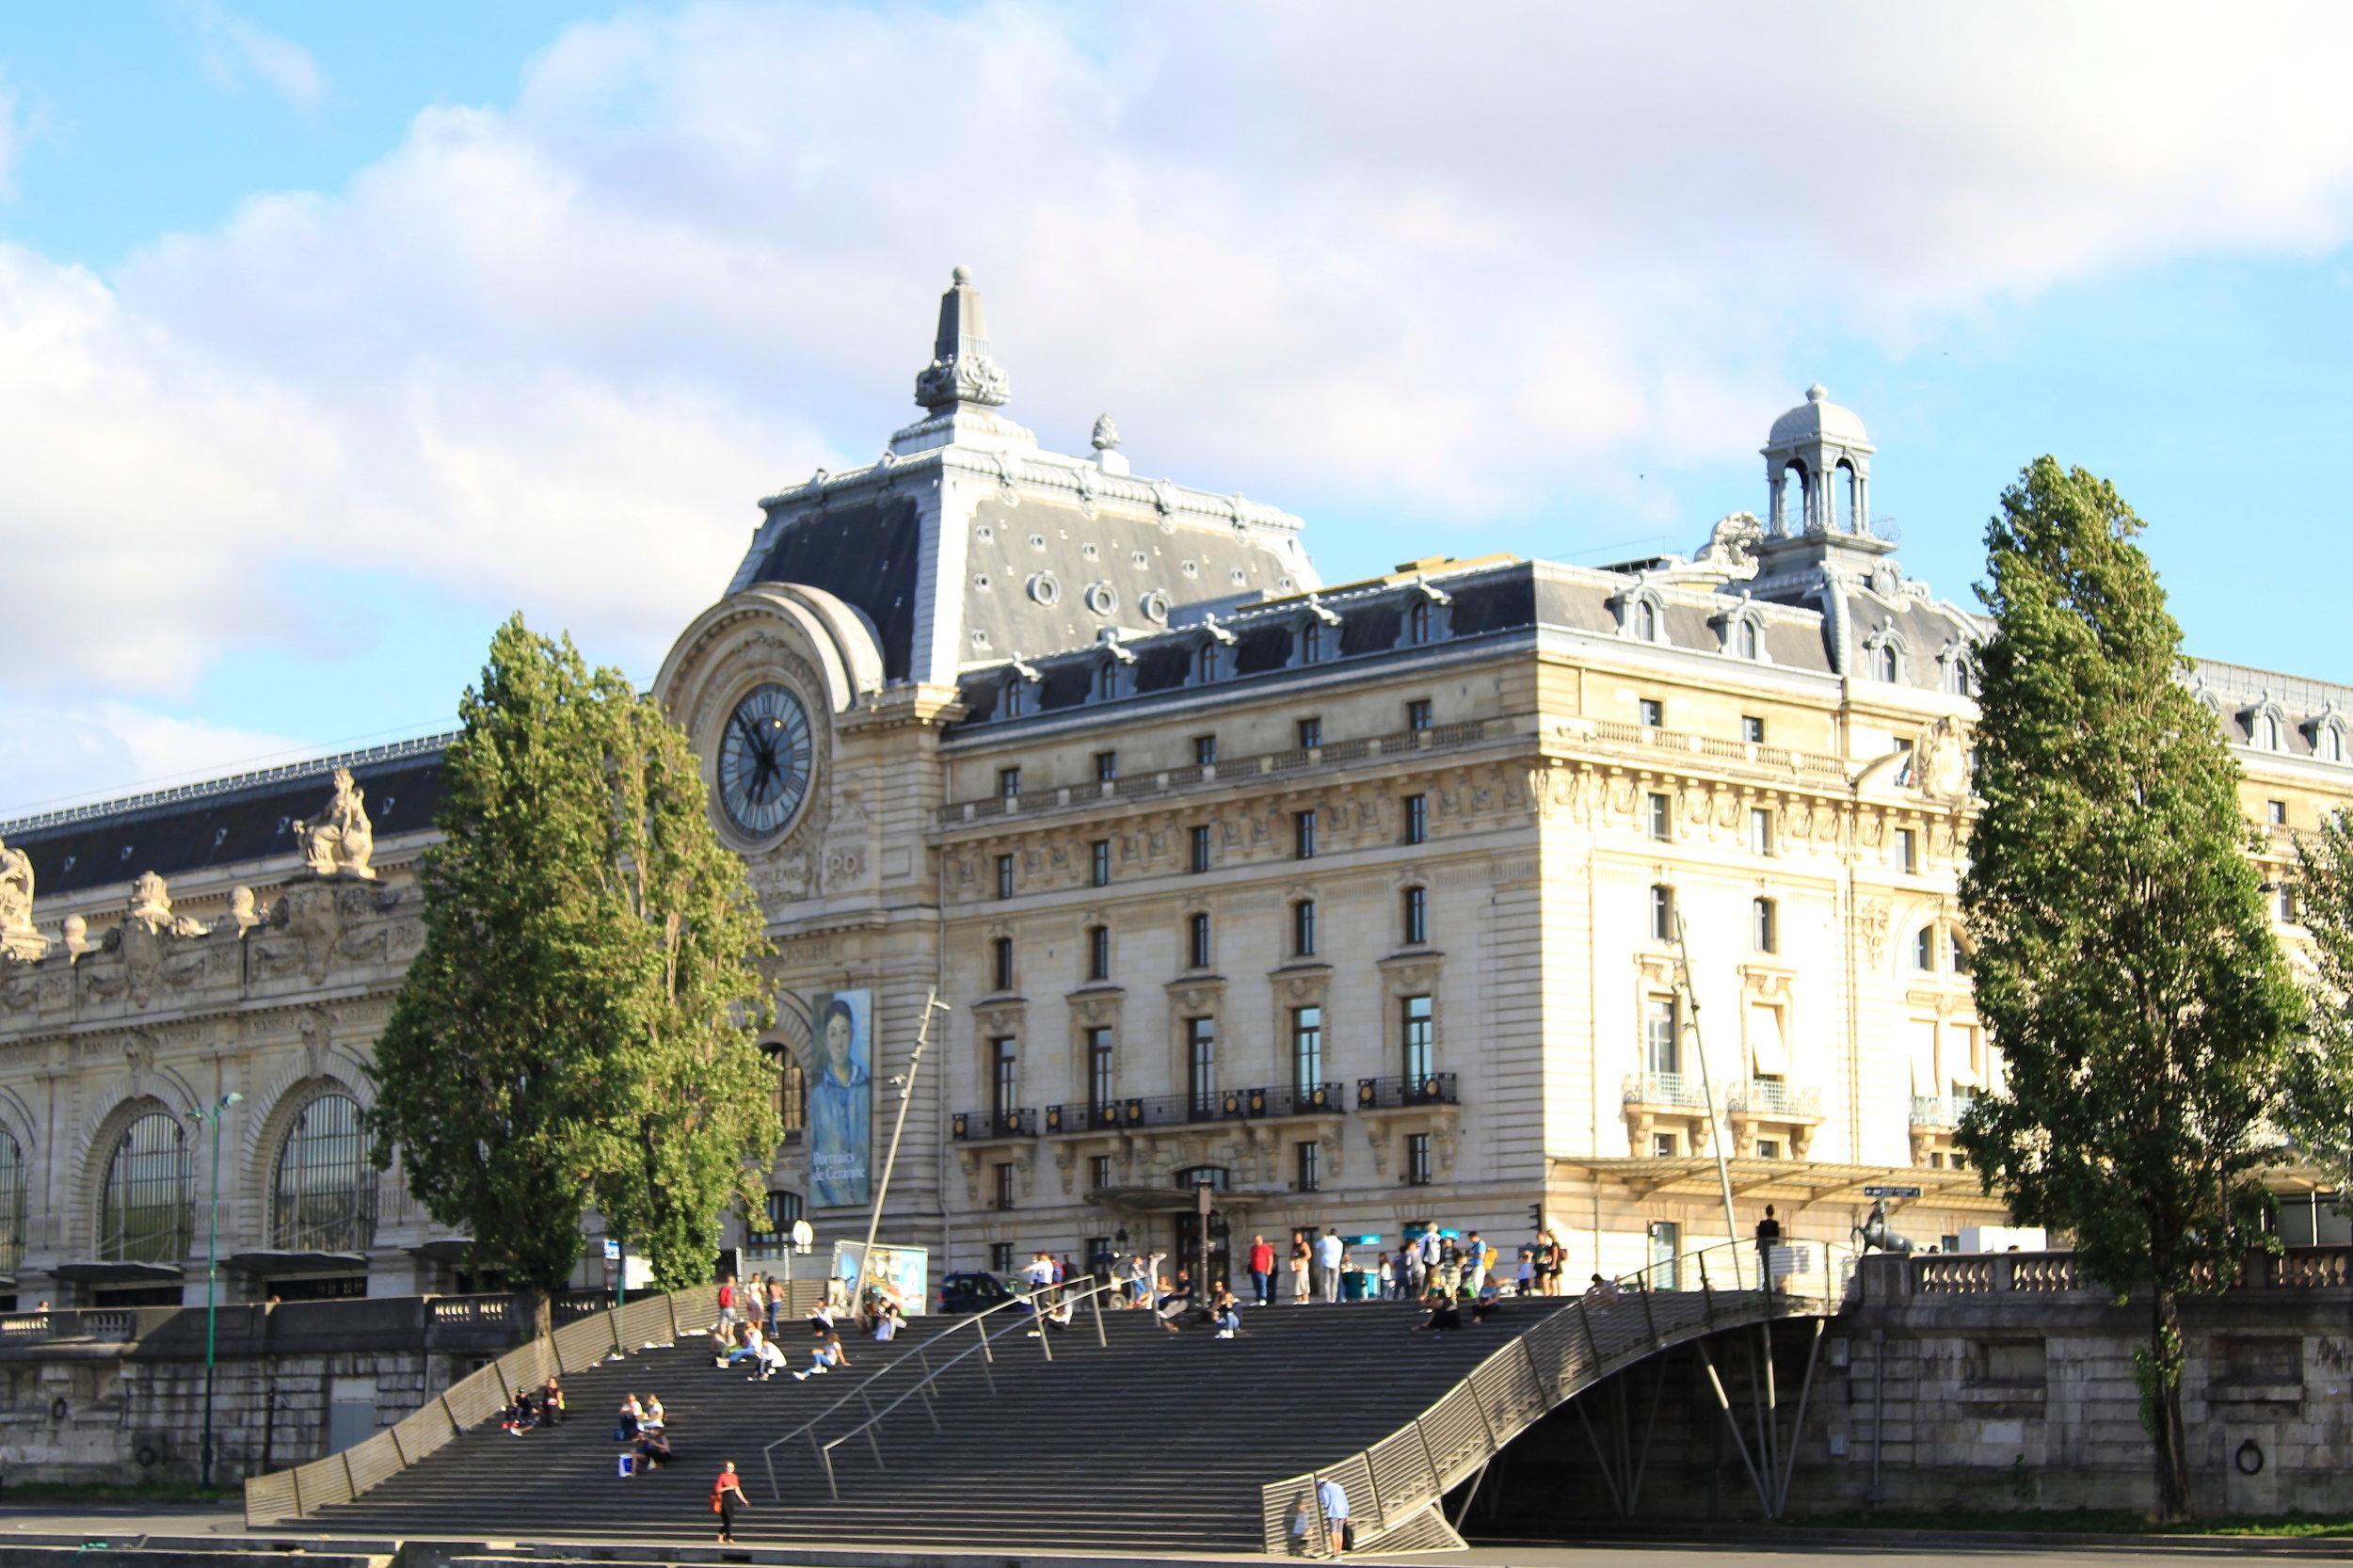 Musée d'Orsay - impressionism hub in Paris